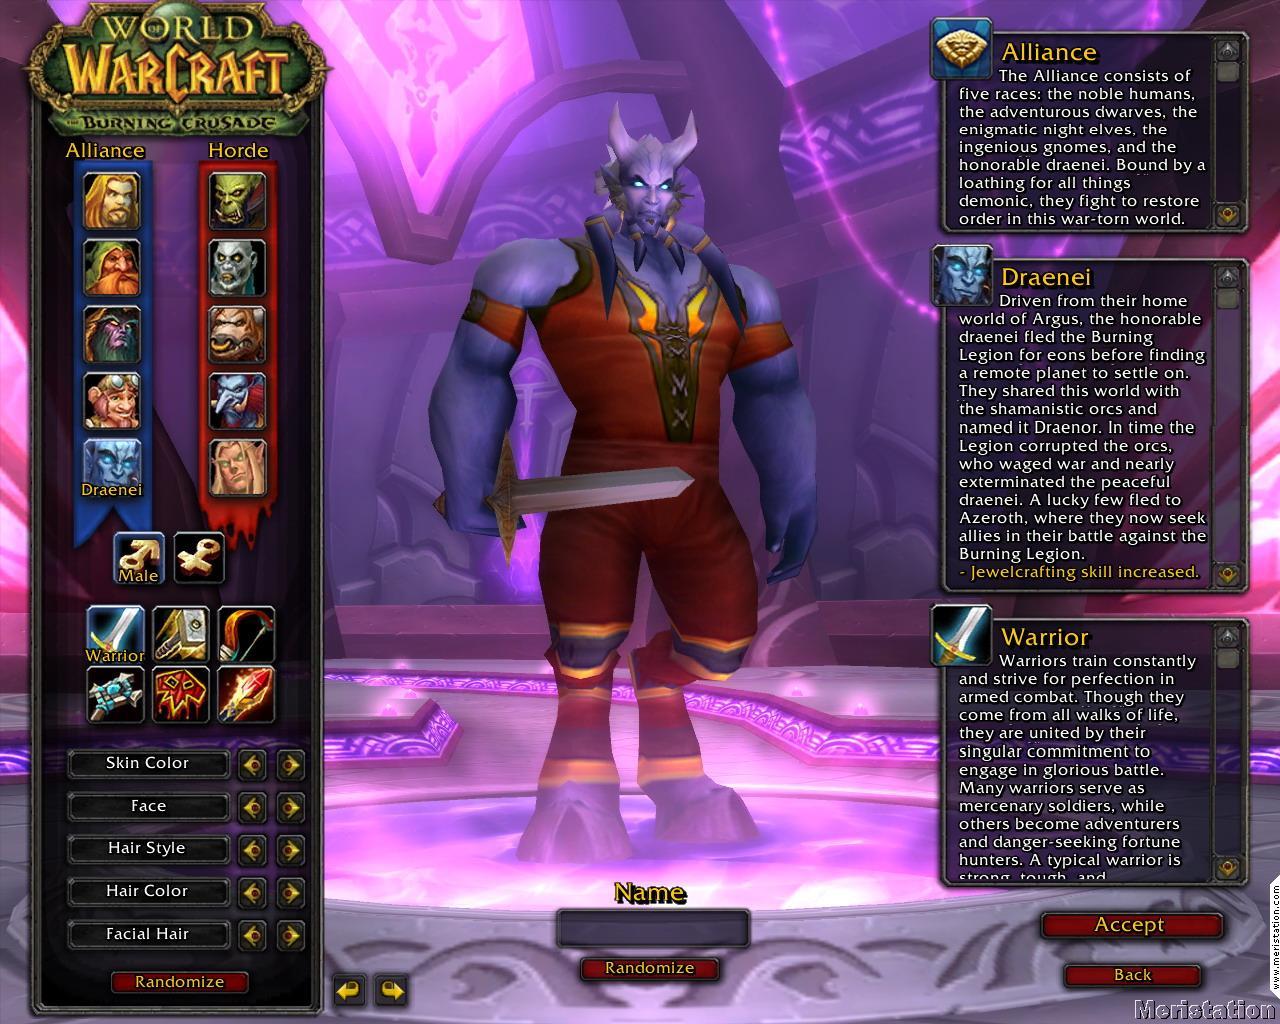 Imágenes De World Of Warcraft The Burning Crusade Meristation